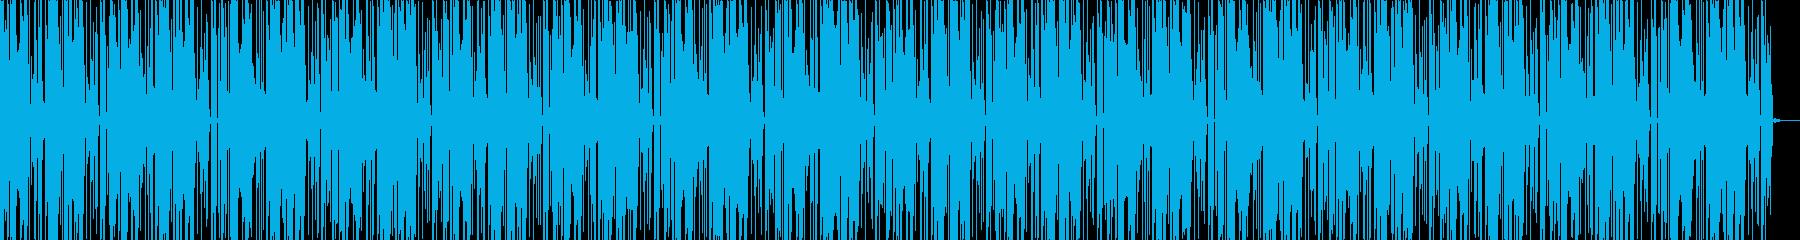 EDMなBGM013の再生済みの波形